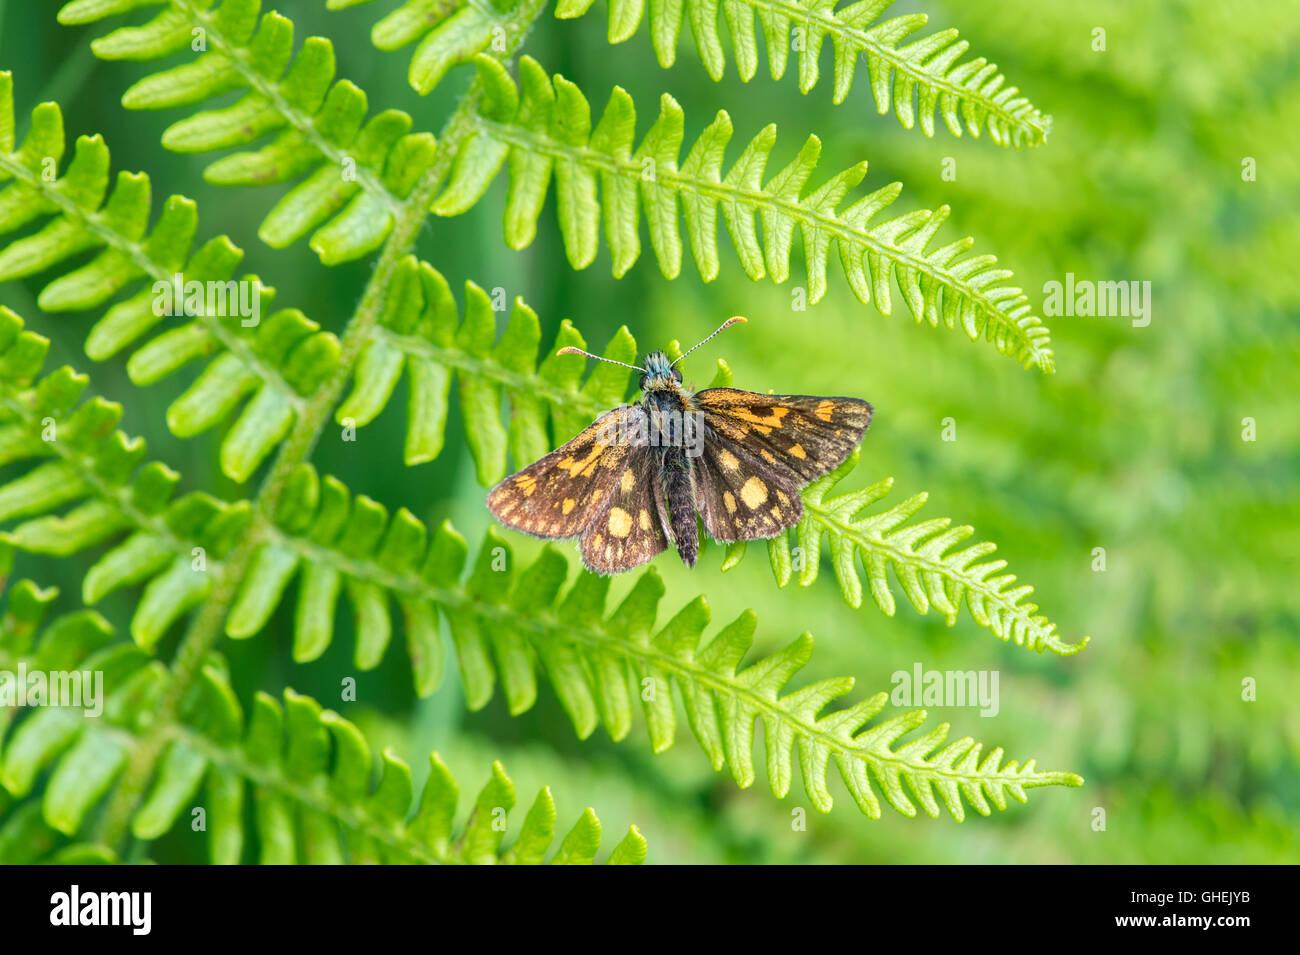 Chequered skipper butterfly (Carterocephalus palaemon) on bracken - UK - Stock Image